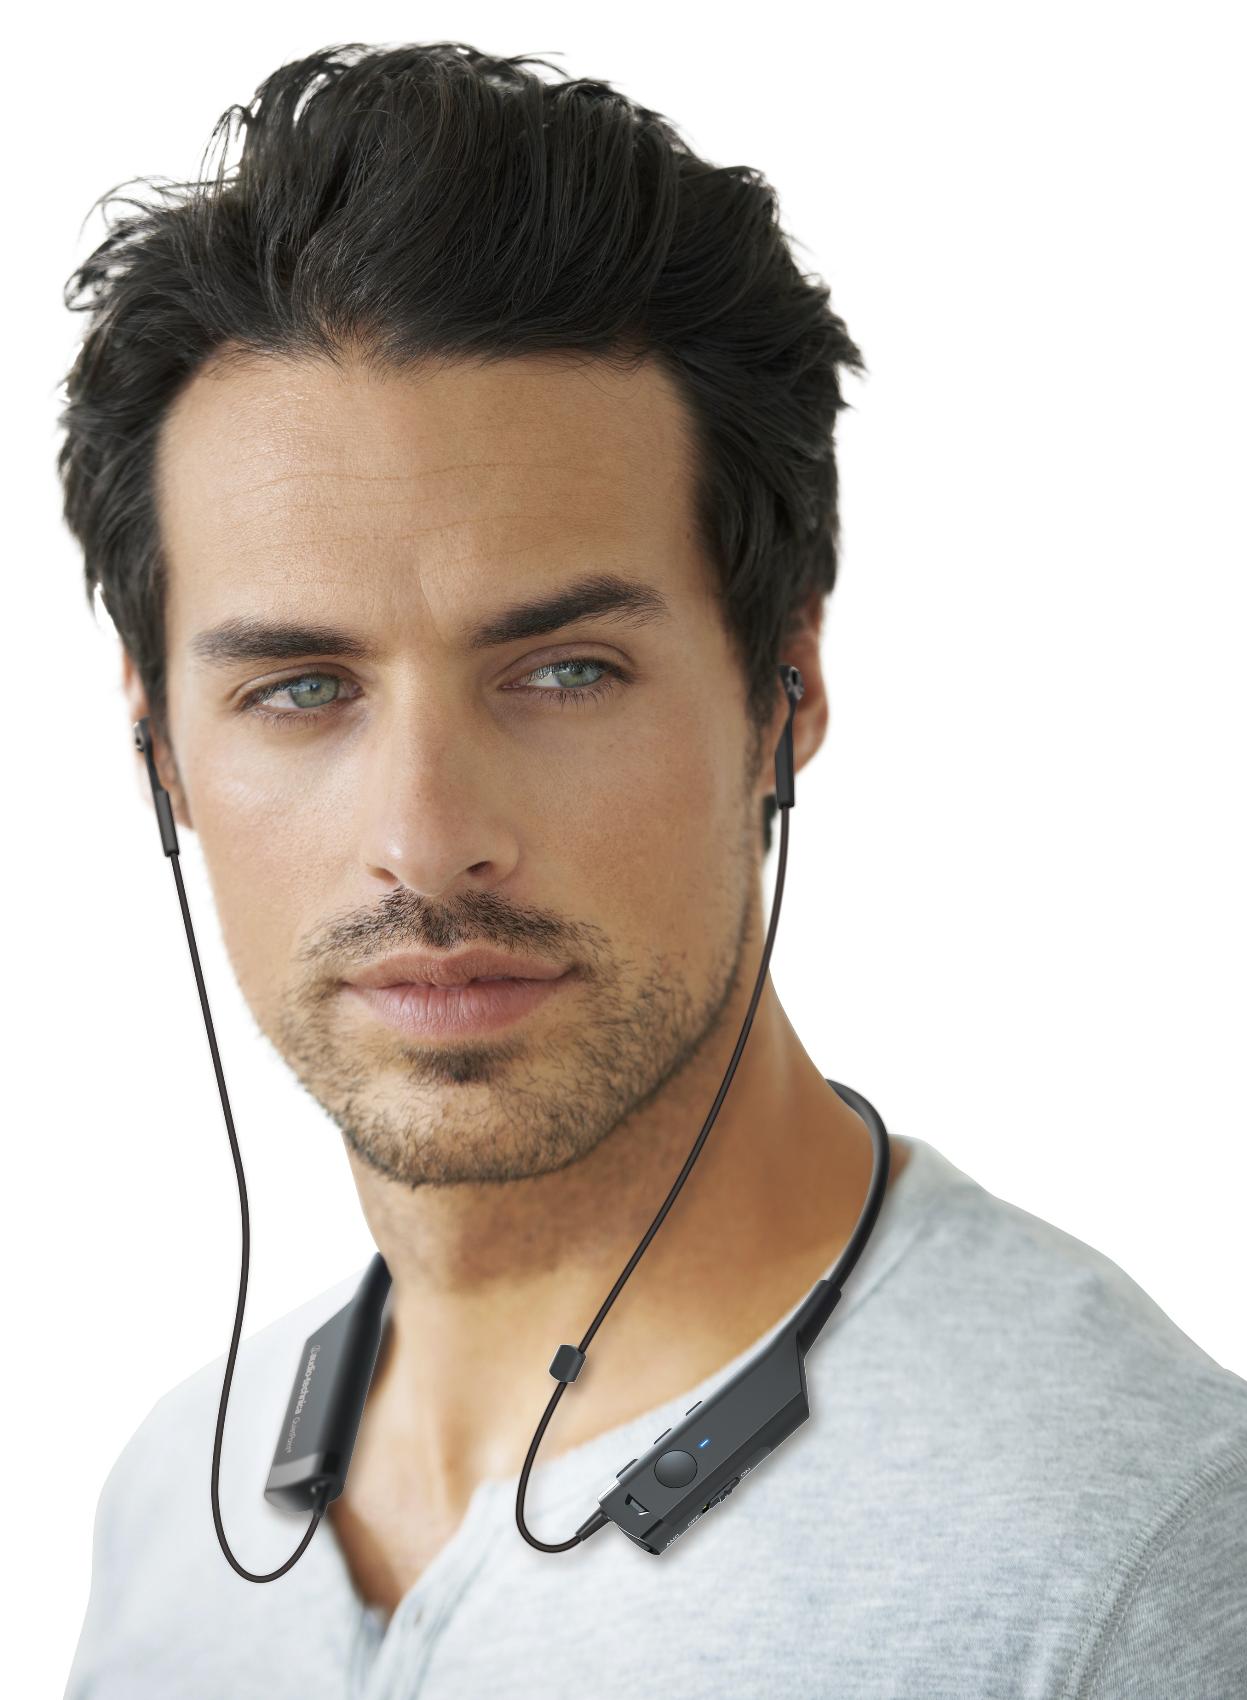 Słuchawki Audio-Technica ATH-ANC40BT lifestyle